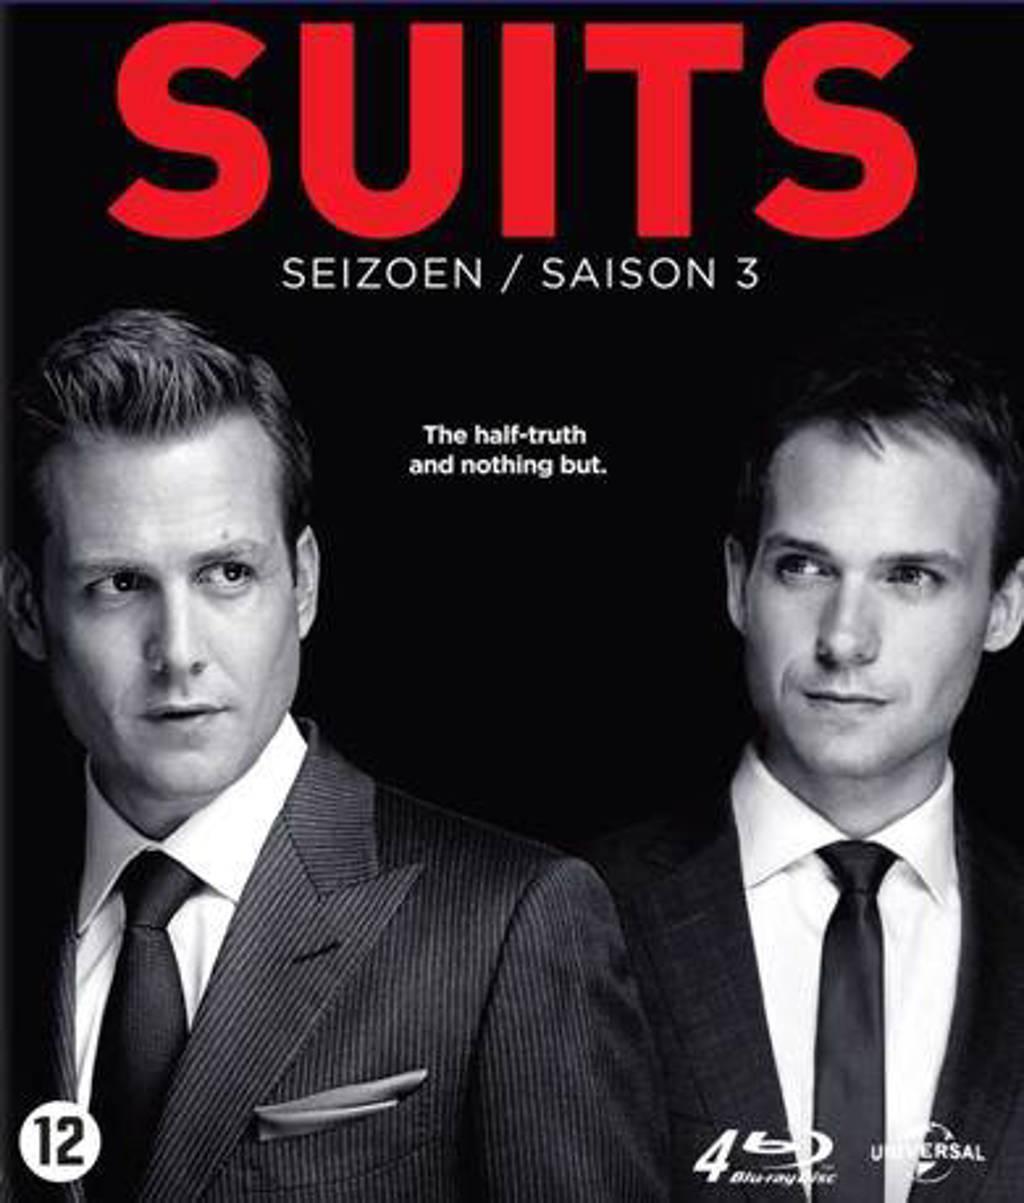 Suits - Seizoen 3 (Blu-ray)